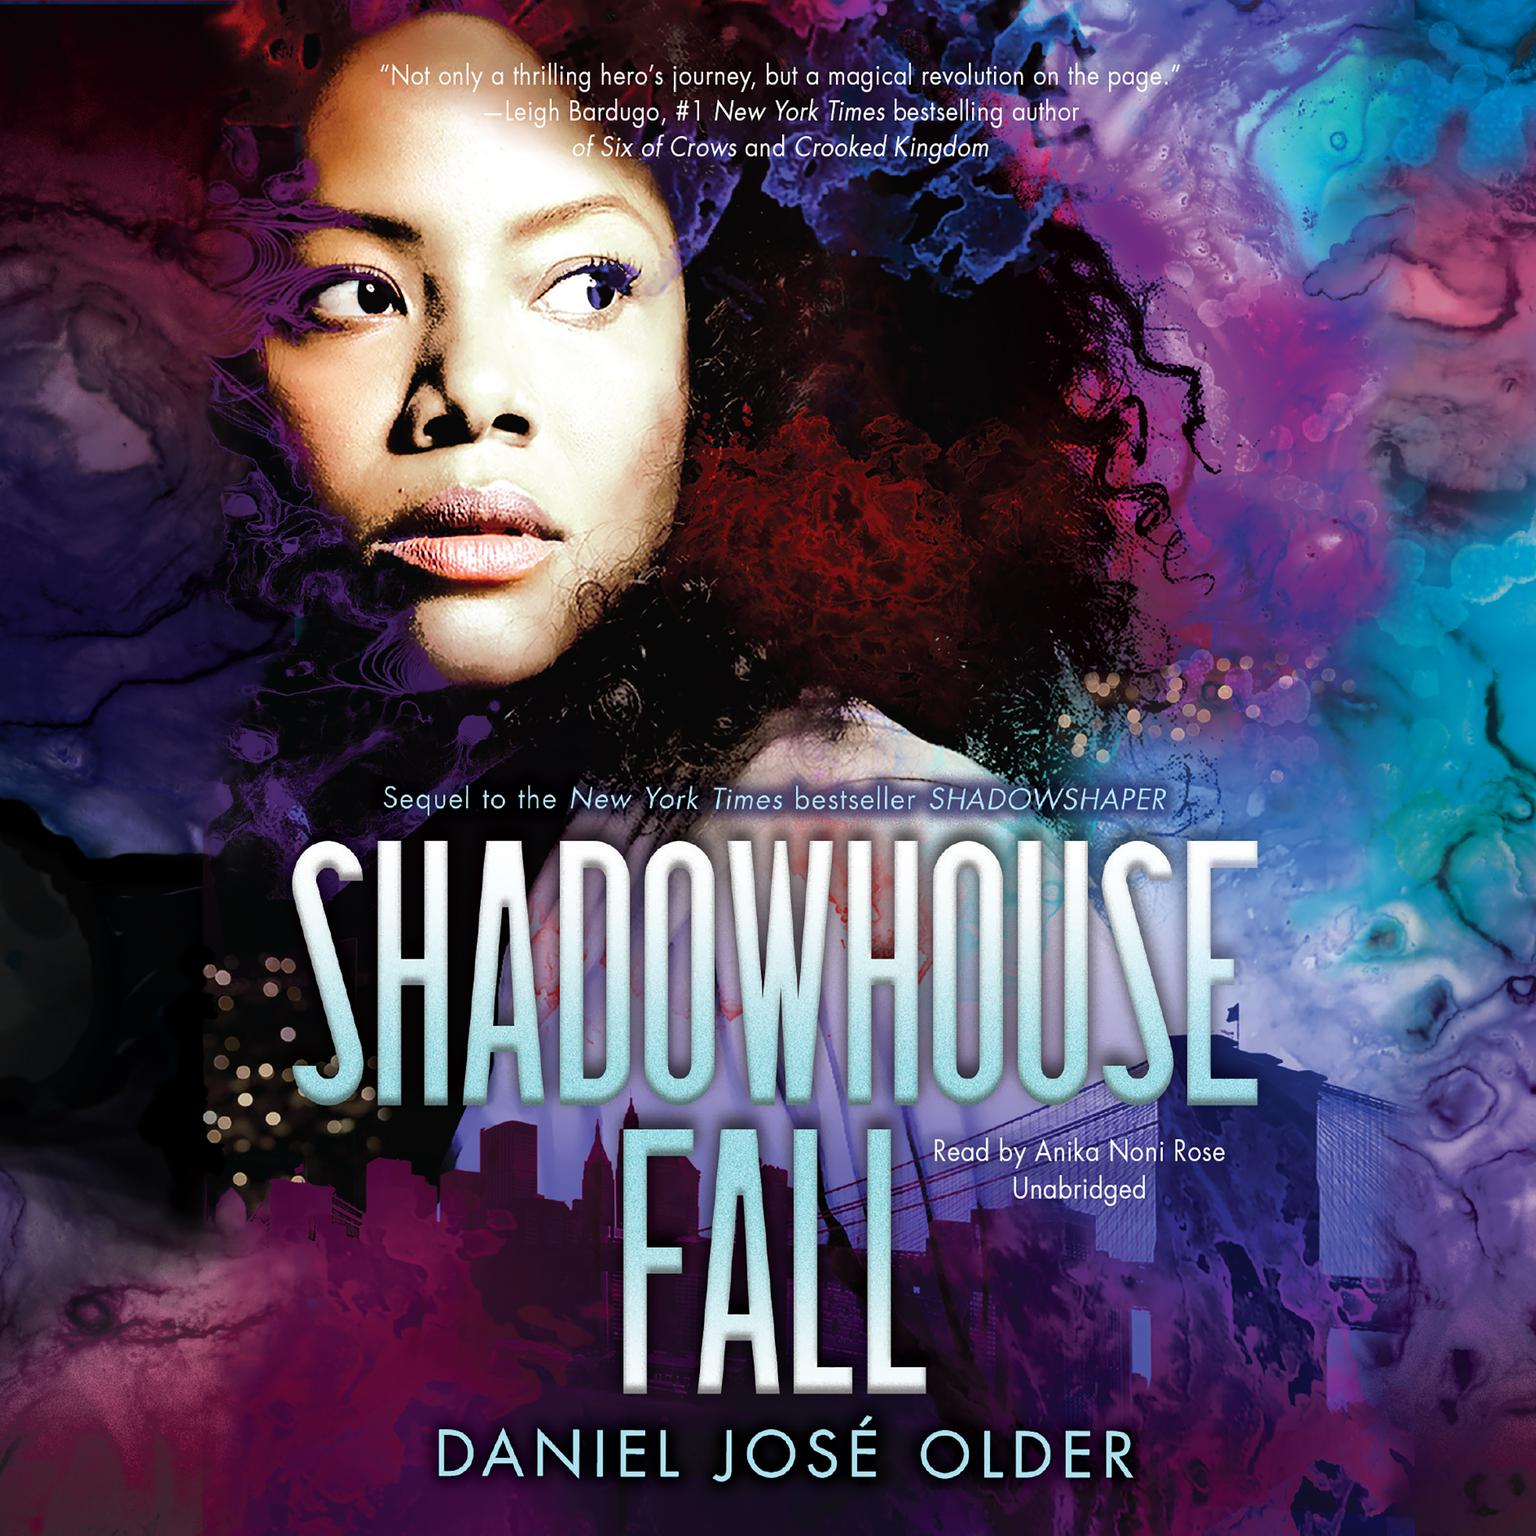 Shadowhouse Fall Audiobook, by Daniel José Older